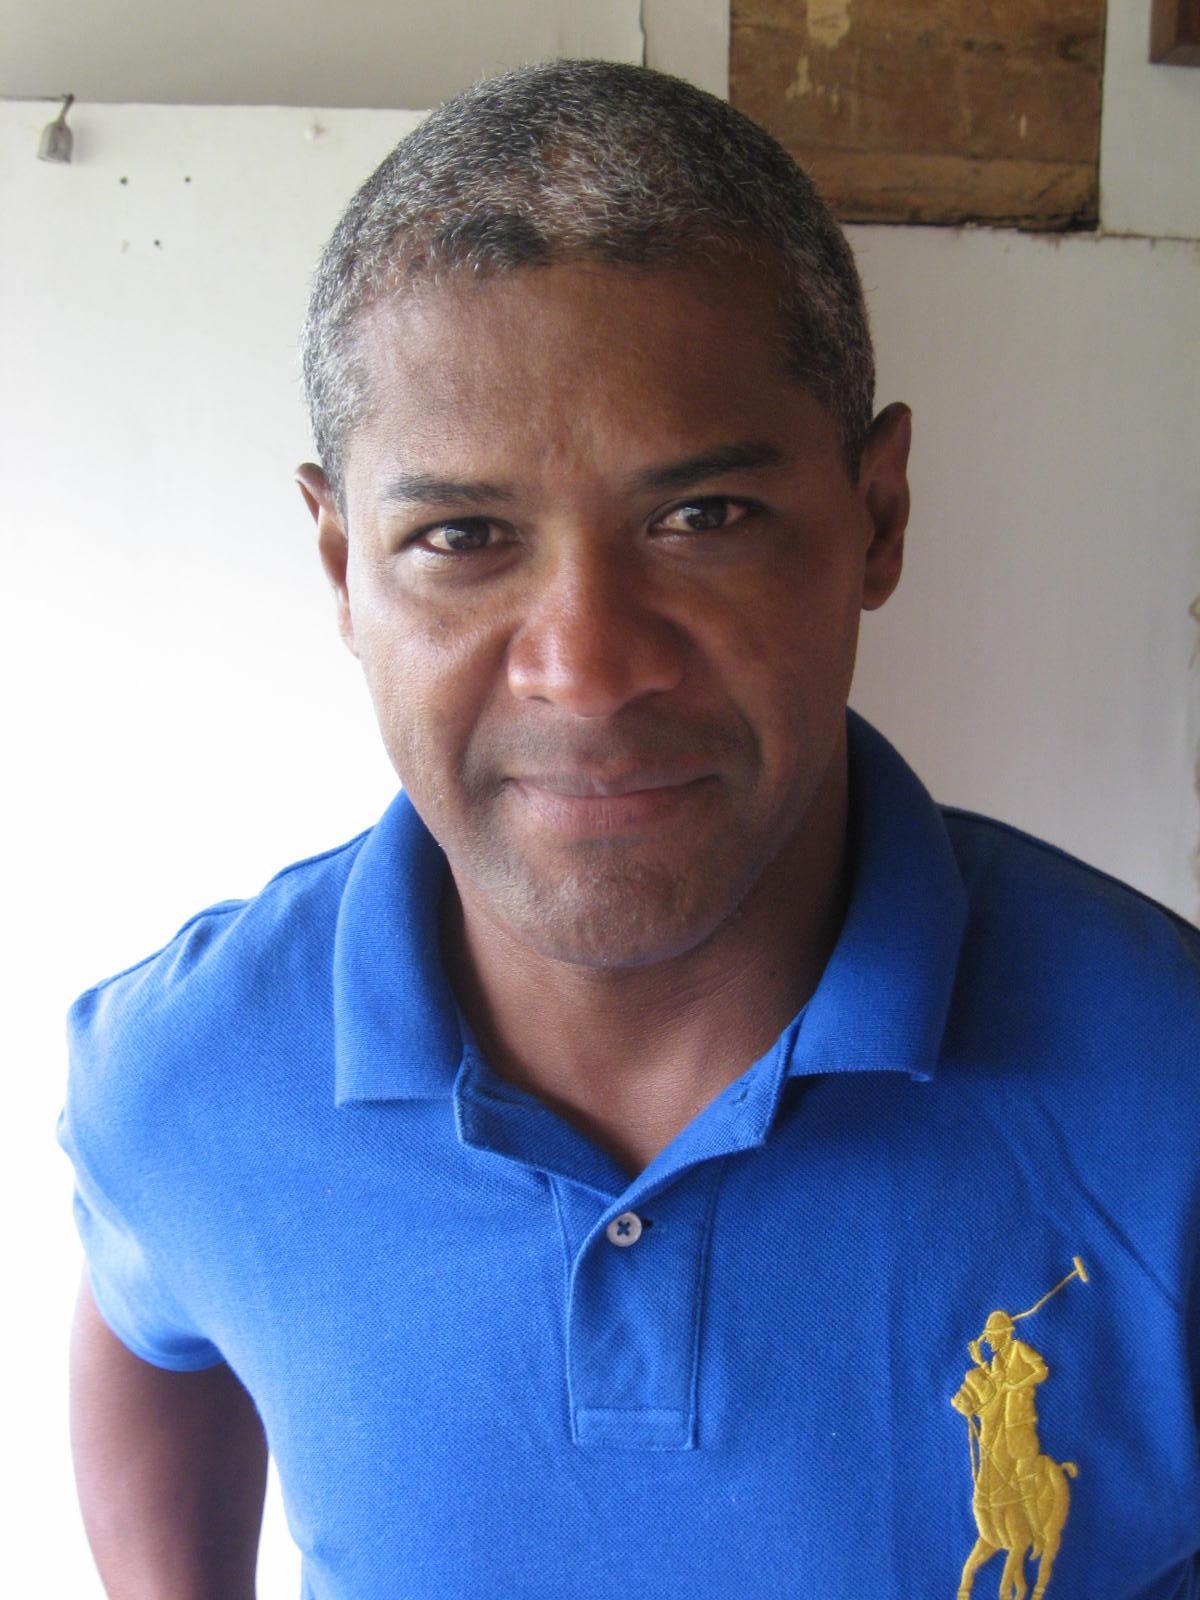 Gérson De Oliveira Nunes intended for carlos augusto josé de lira – wikipédia, a enciclopédia livre